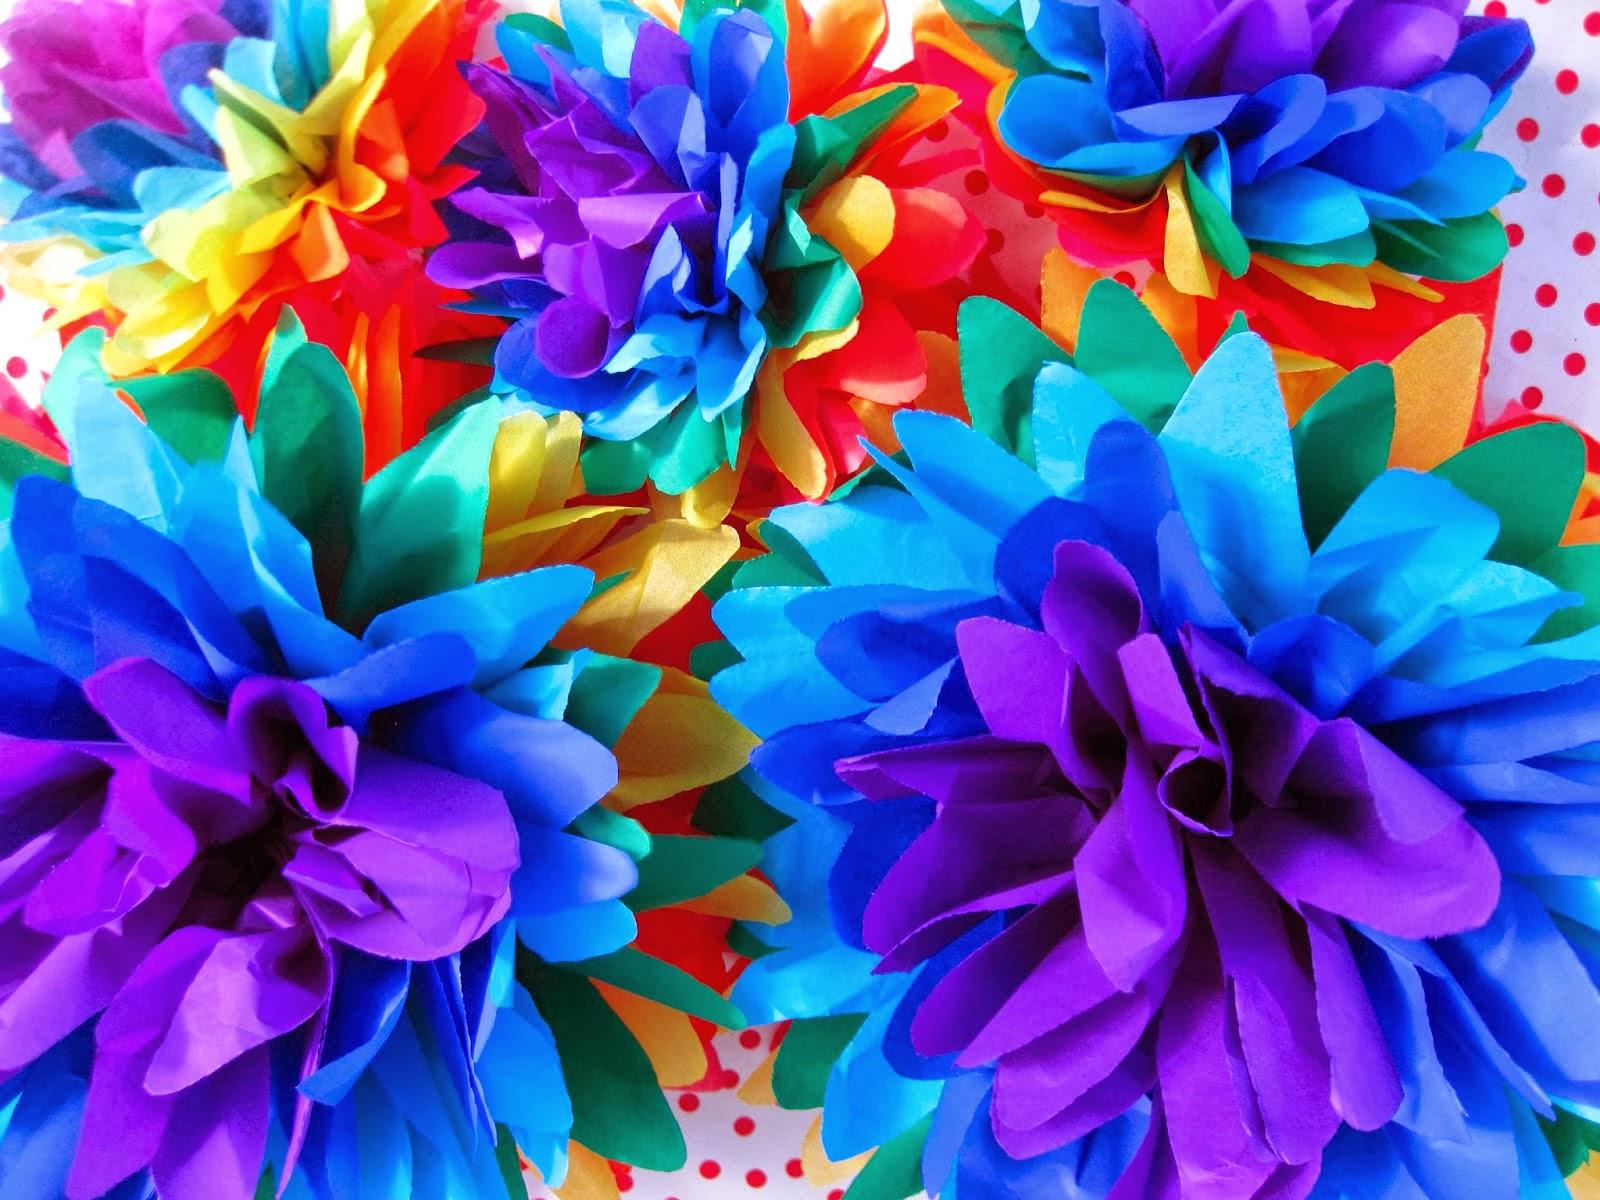 rainbow flower background - photo #16